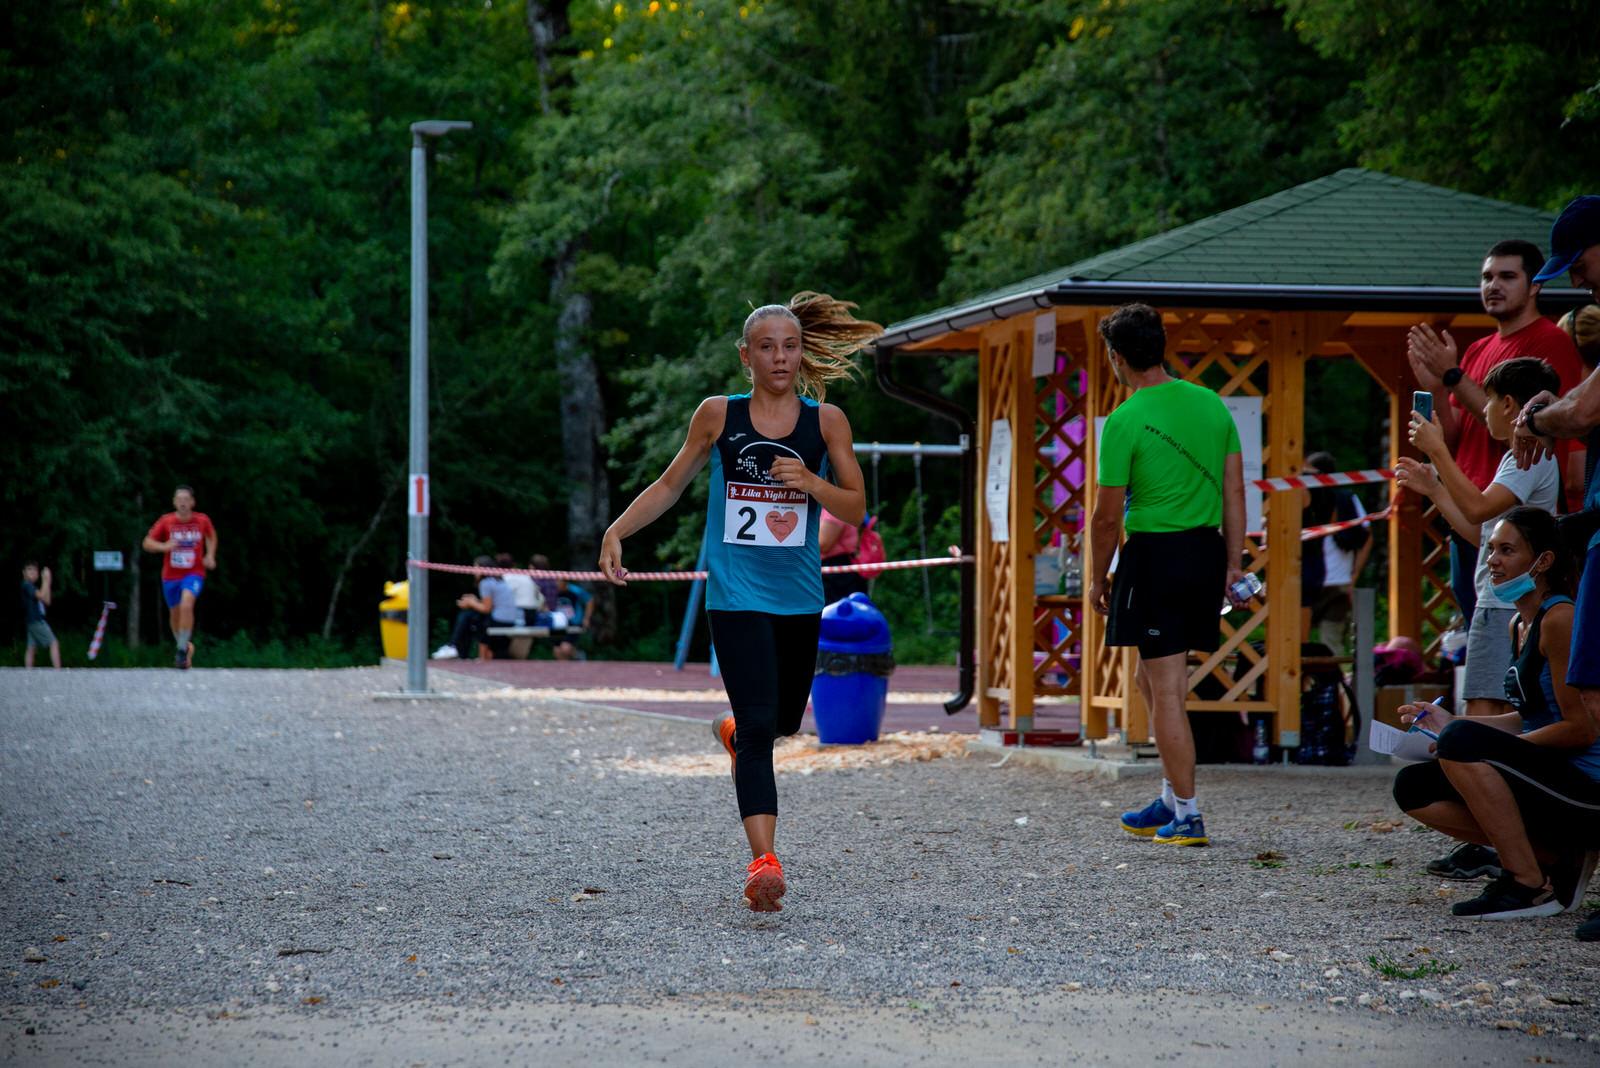 likaclub_lika night run_jasikovac_7_2020 (19)